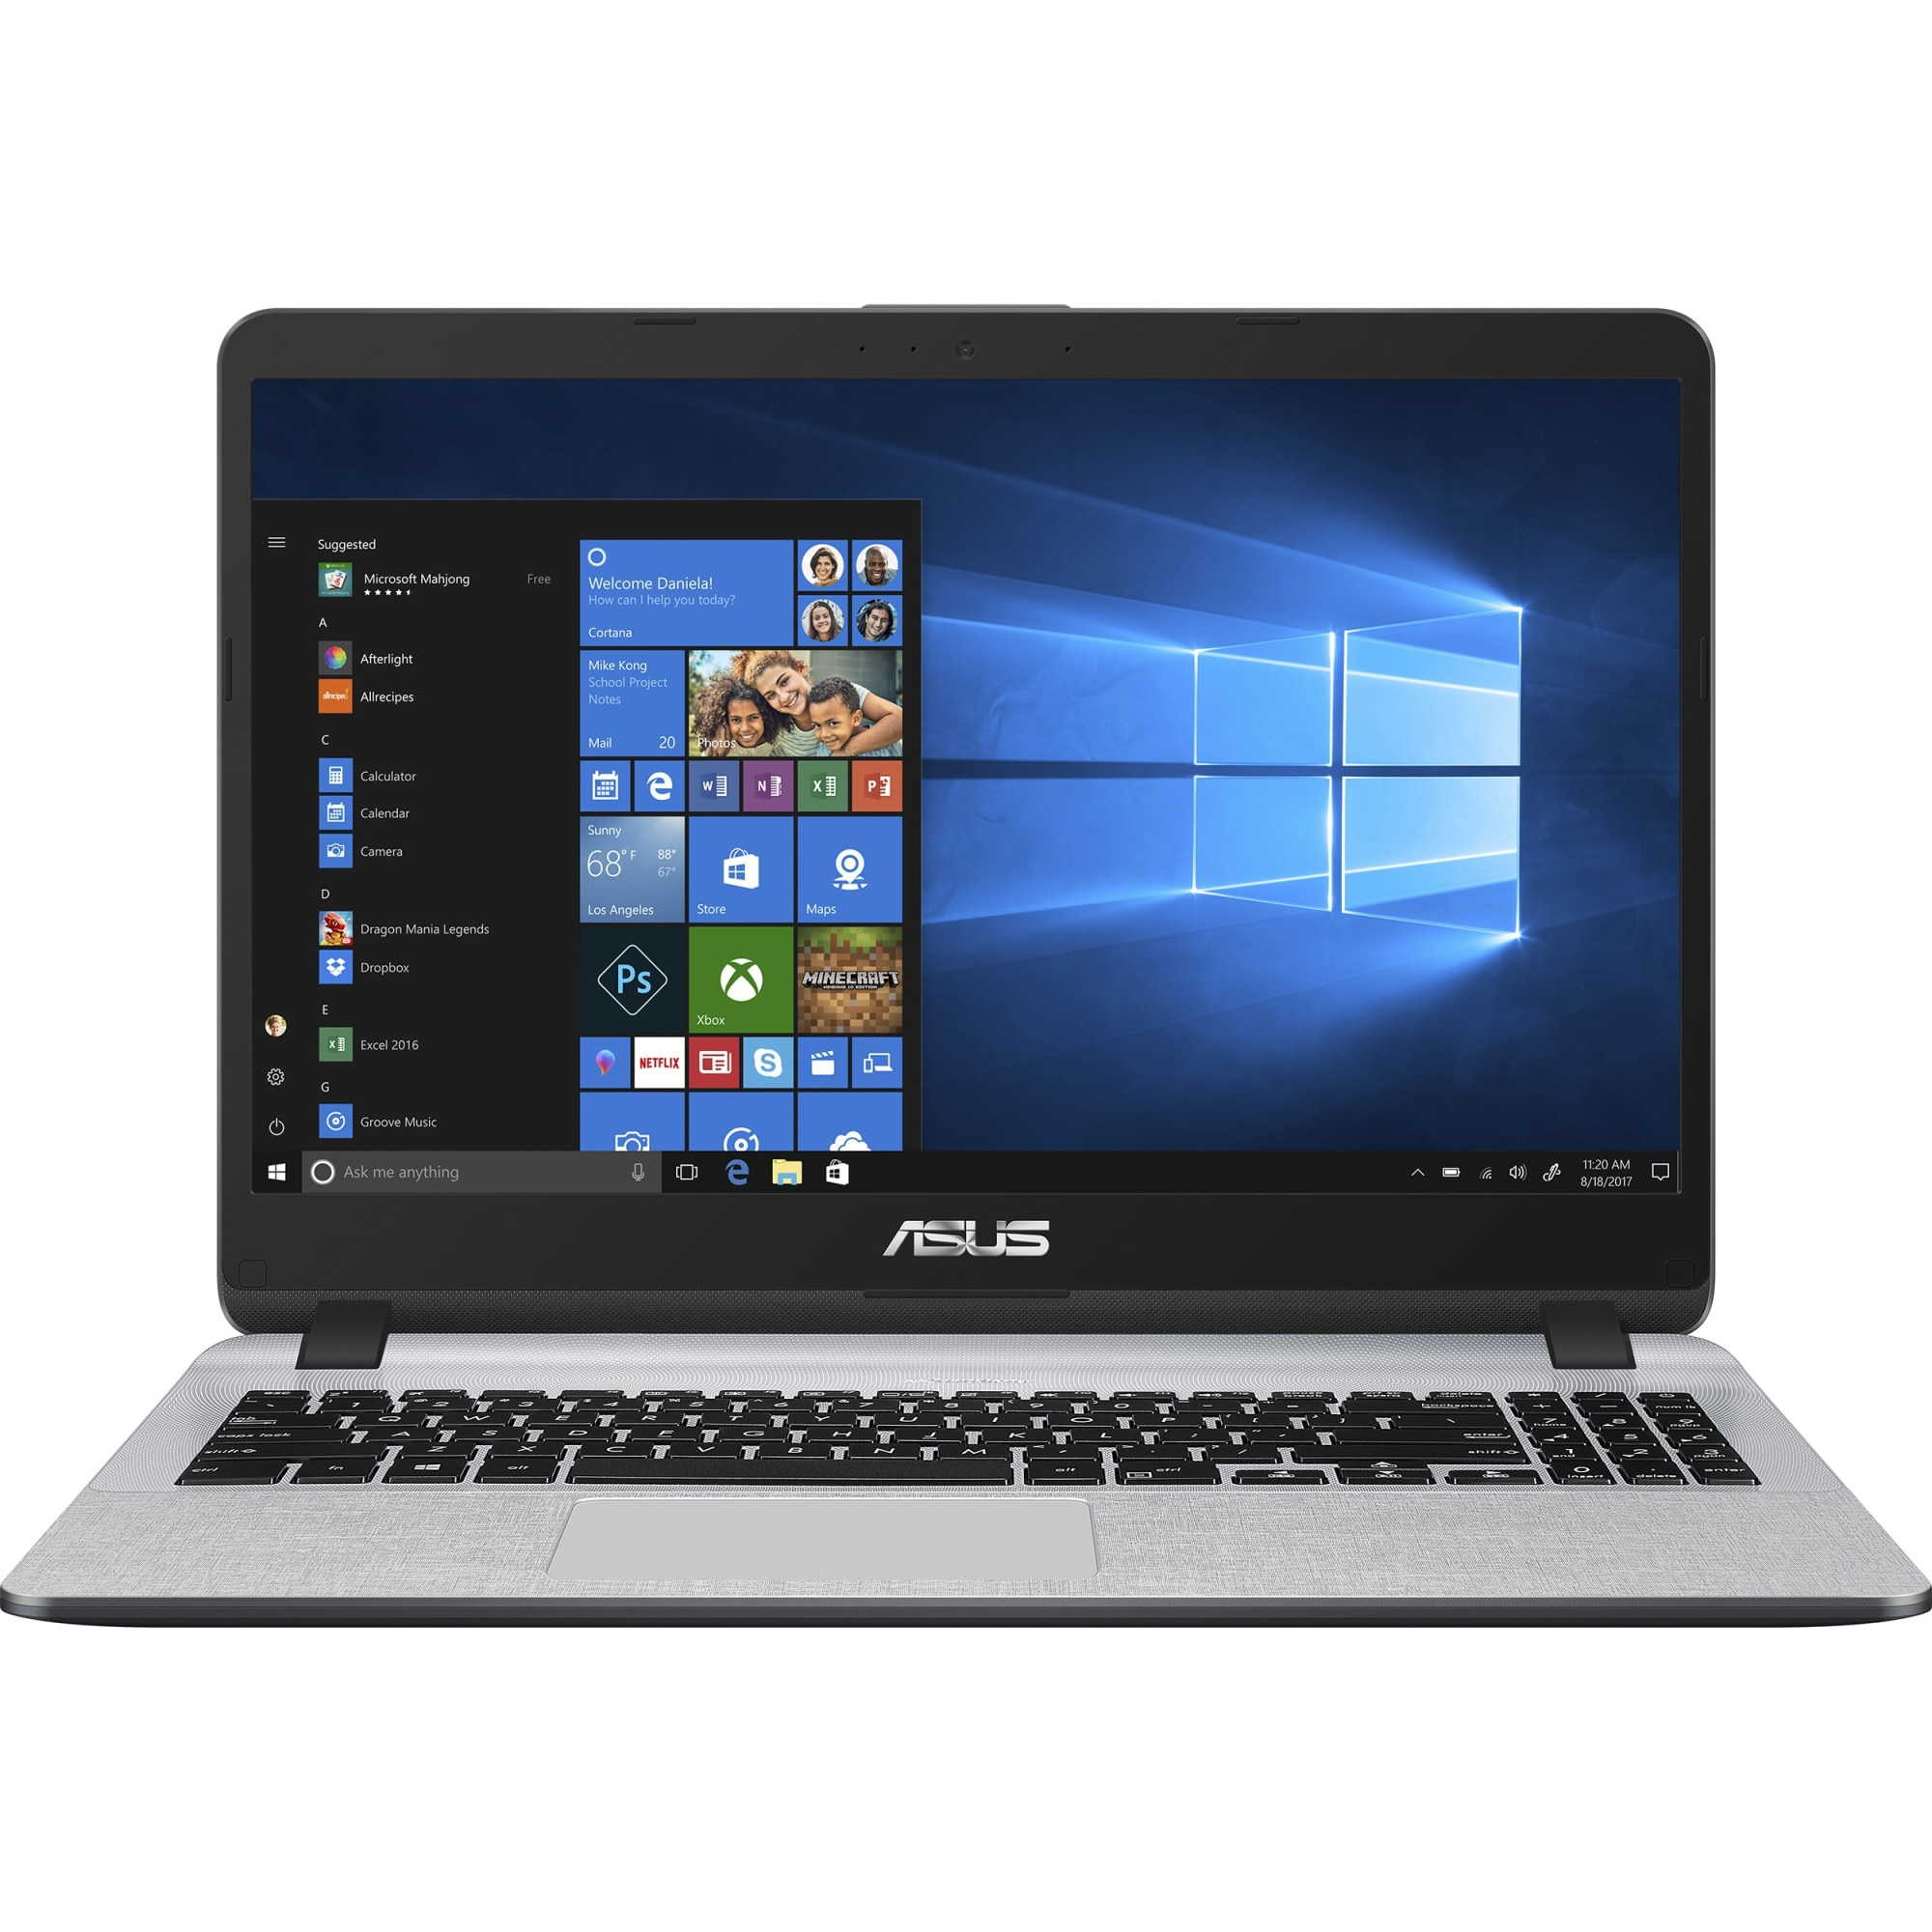 "Fotografie Laptop ASUS X507UA cu procesor Intel® Core™ i5-8250U pana la 3.40 GHz, Kaby Lake R, 15.6"", Full HD, 8GB, 256GB SSD, Intel UHD Graphics 620, Microsoft Windows 10, Star Grey"